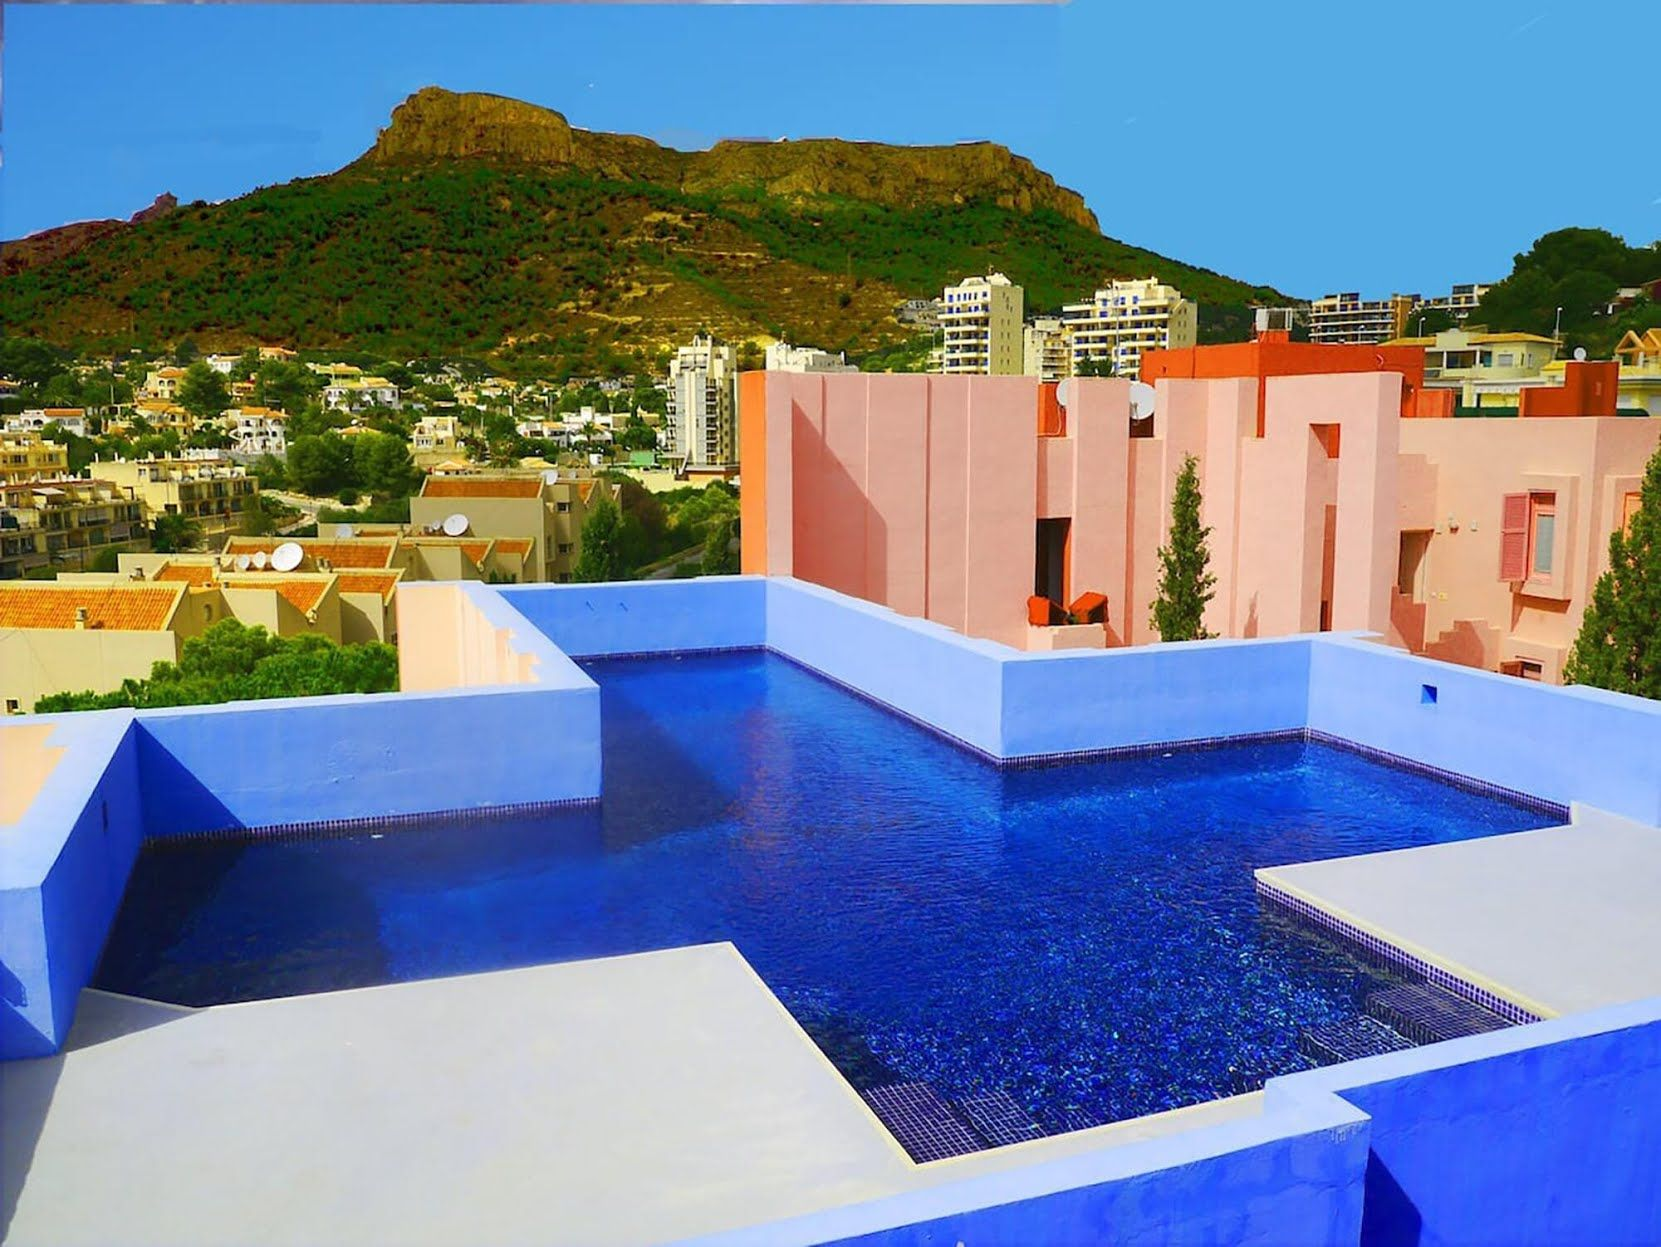 Житловий комплекс La Muralla Roja